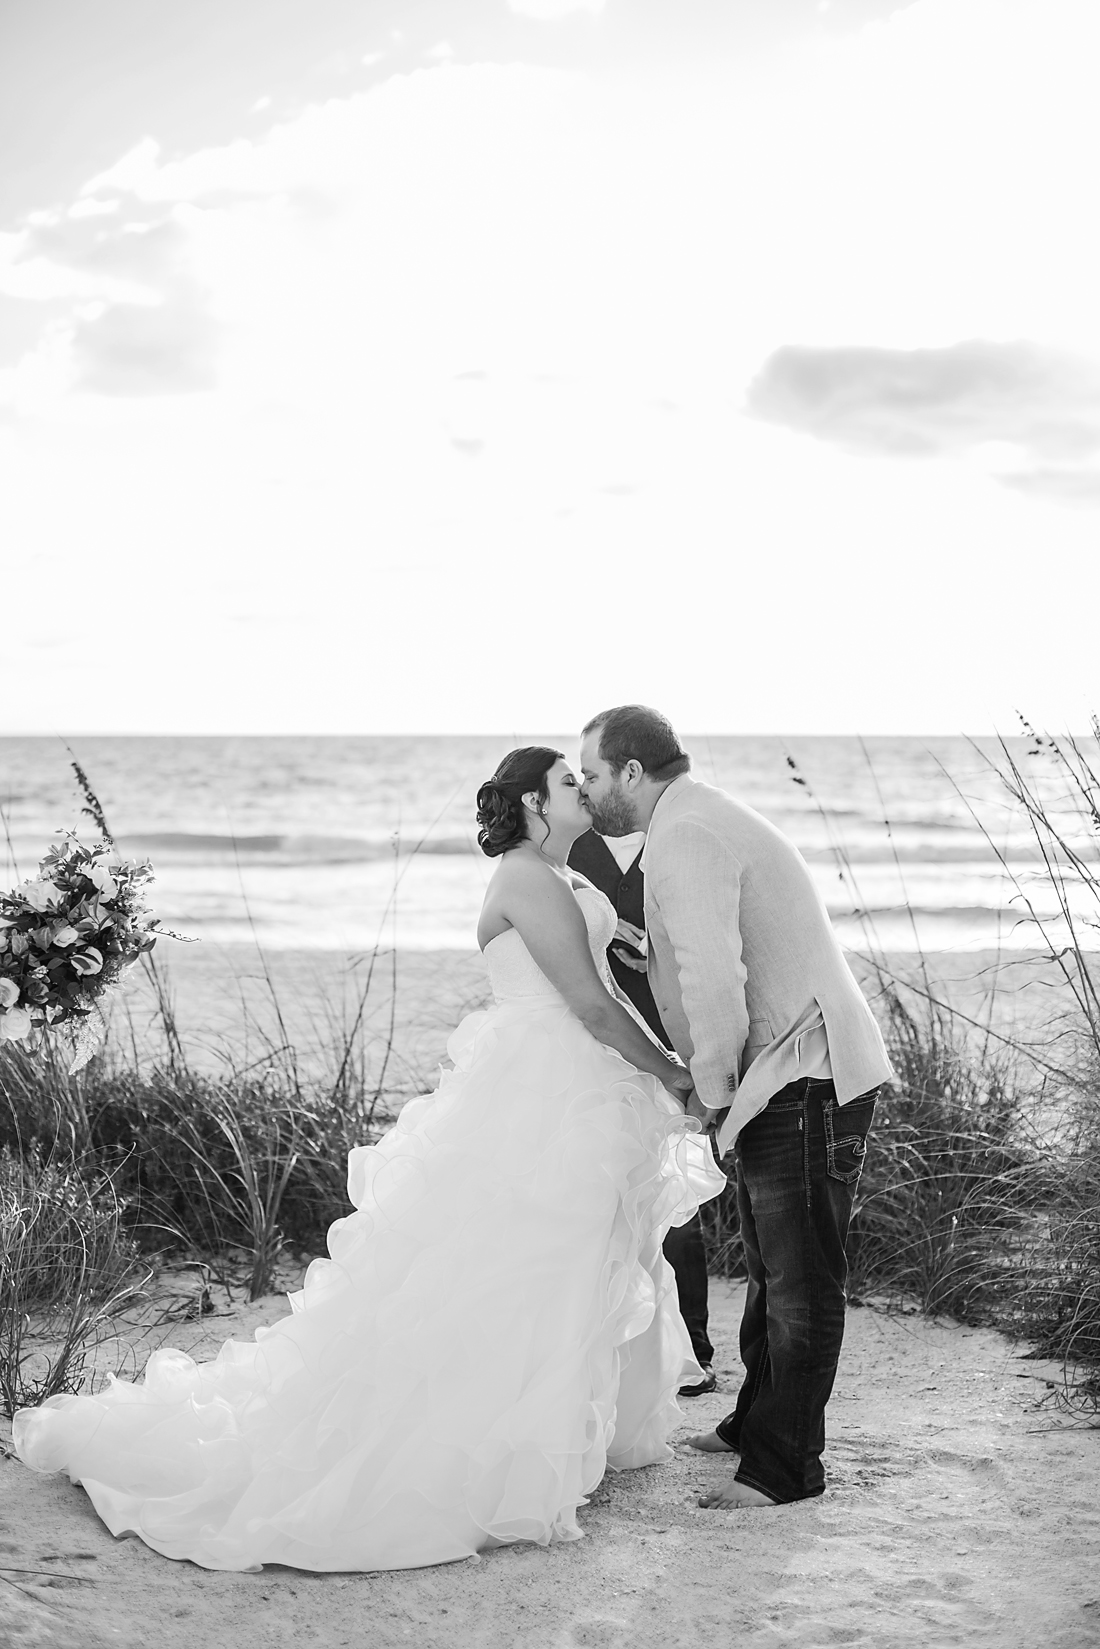 Bailey + Chalin - Anna Maria Island Wedding Photographer - Destination Wedding Photography - Emily & Co. Photography - Beach Wedding Photography (26).jpg